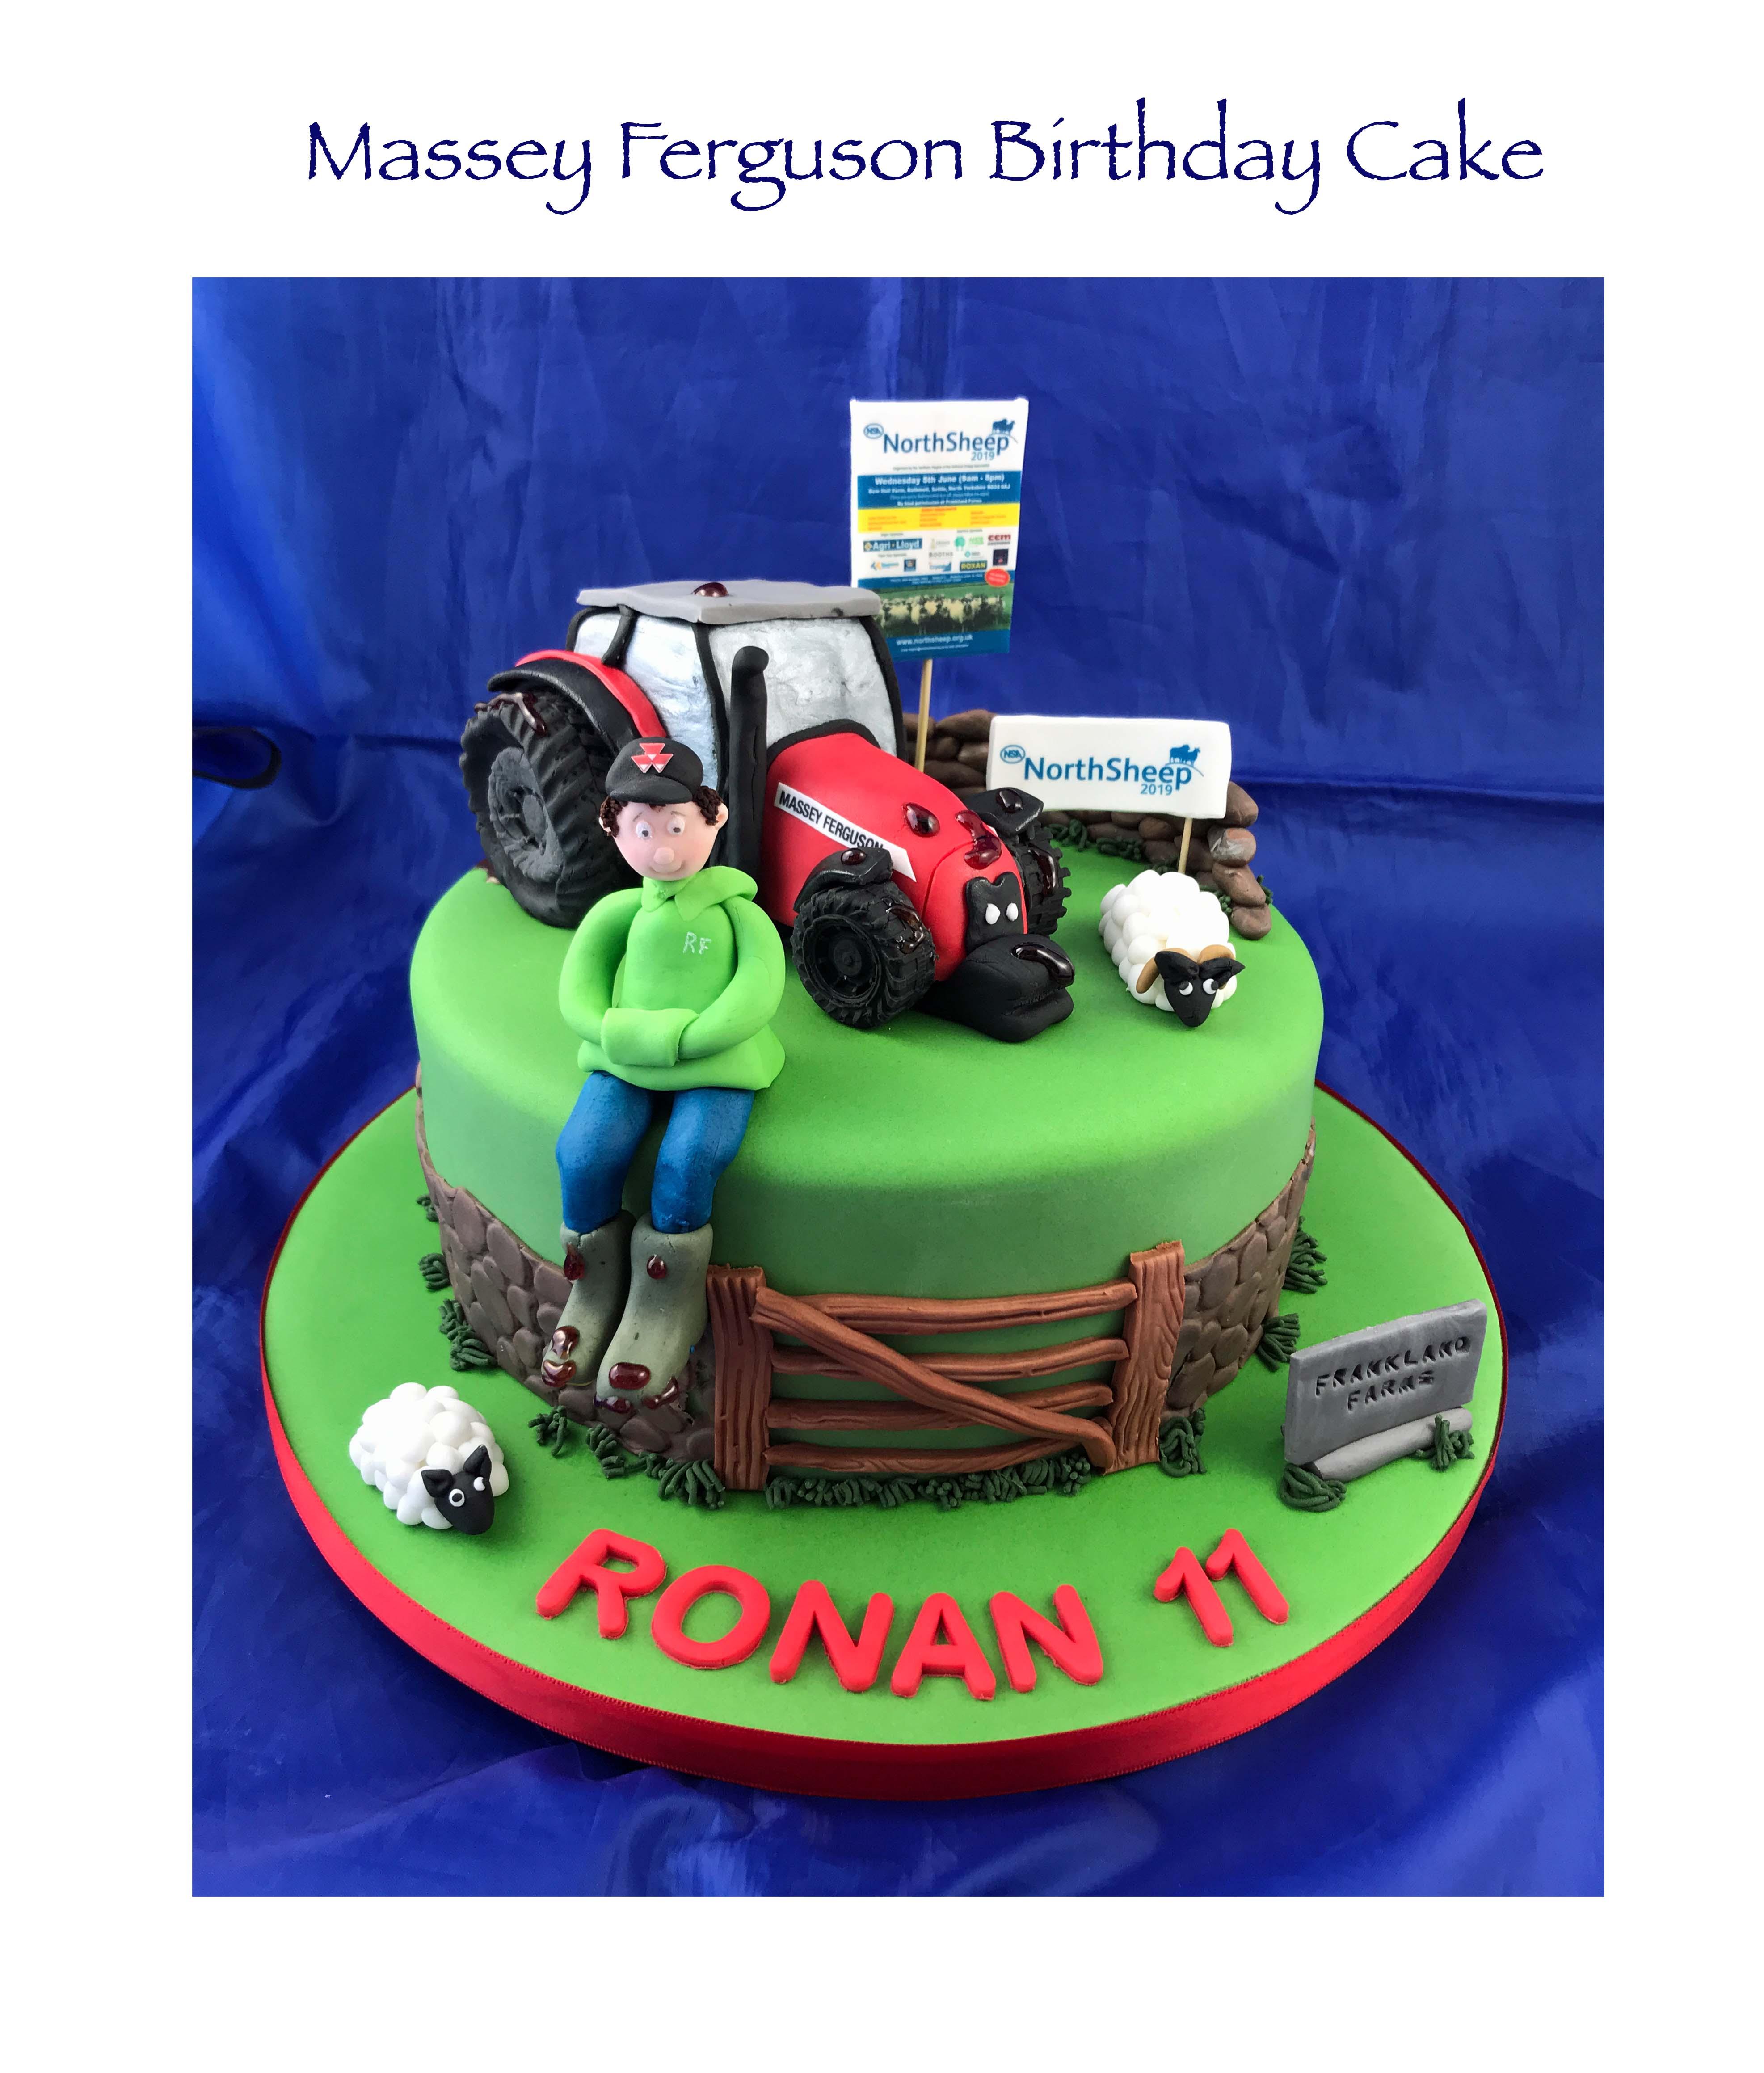 Massey Ferguson Tractor - Sheep Show Cak